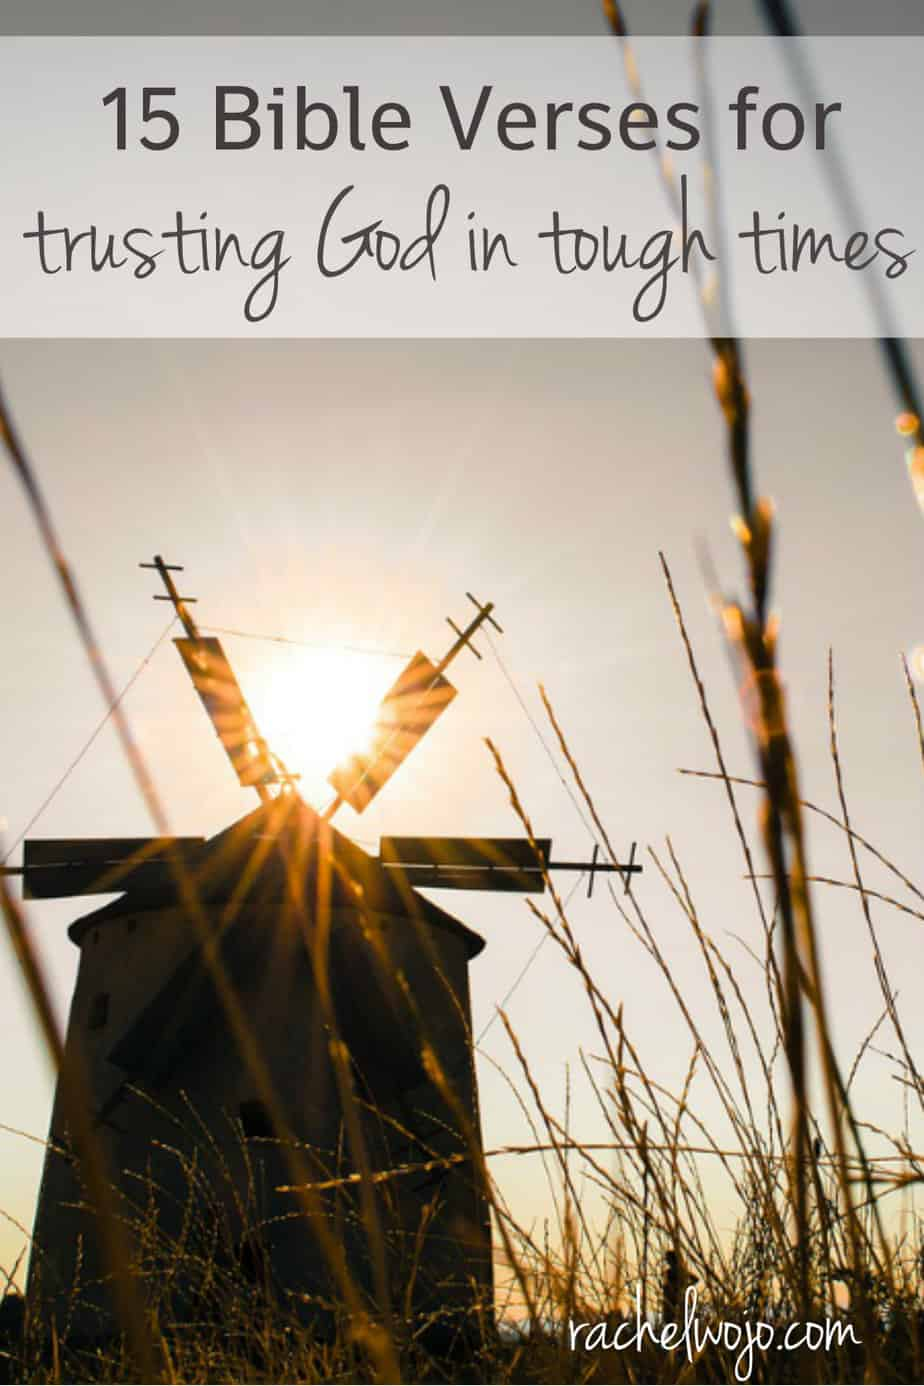 15 bible verses for trusting god in tough times rachelwojo com